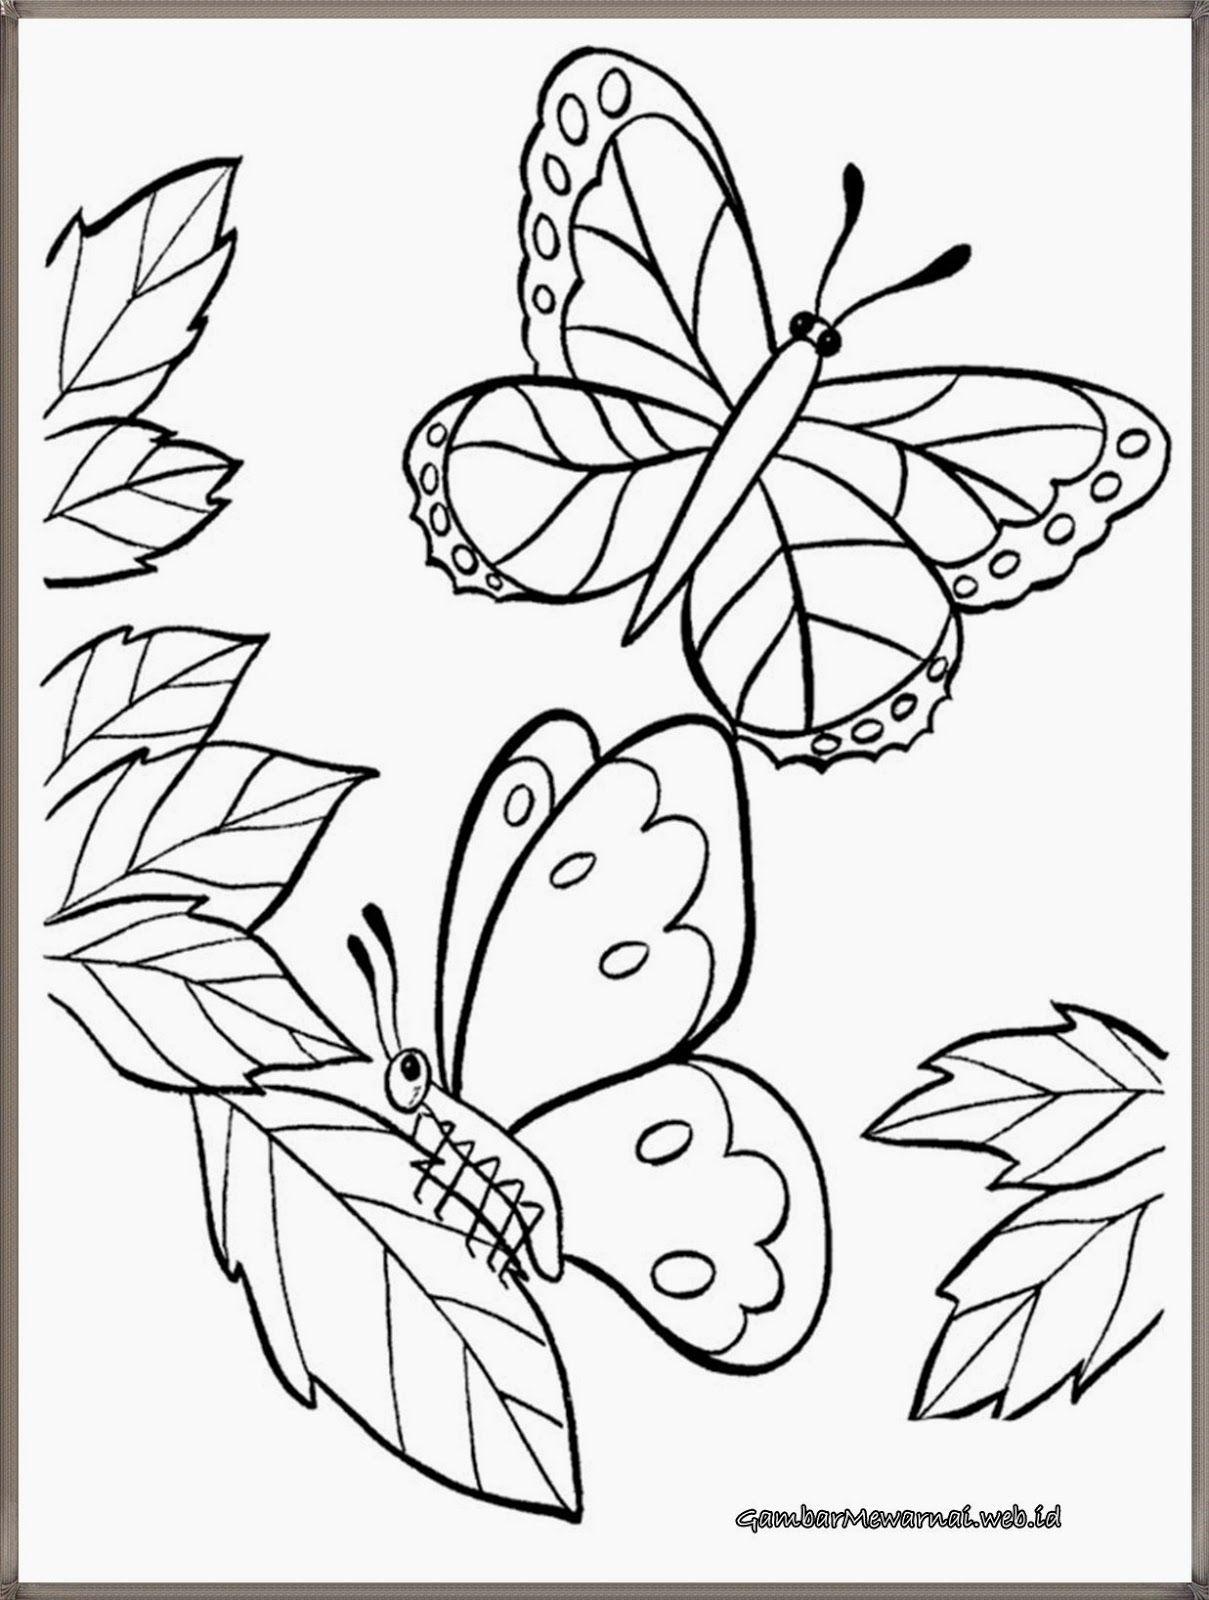 Gambar Bunga Dan Kupu-kupu : gambar, bunga, kupu-kupu, Mewarnai, Gambar, Kupu-kupu, Bunga, Halaman, Mewarnai,, Menggambar, Kupu-kupu,